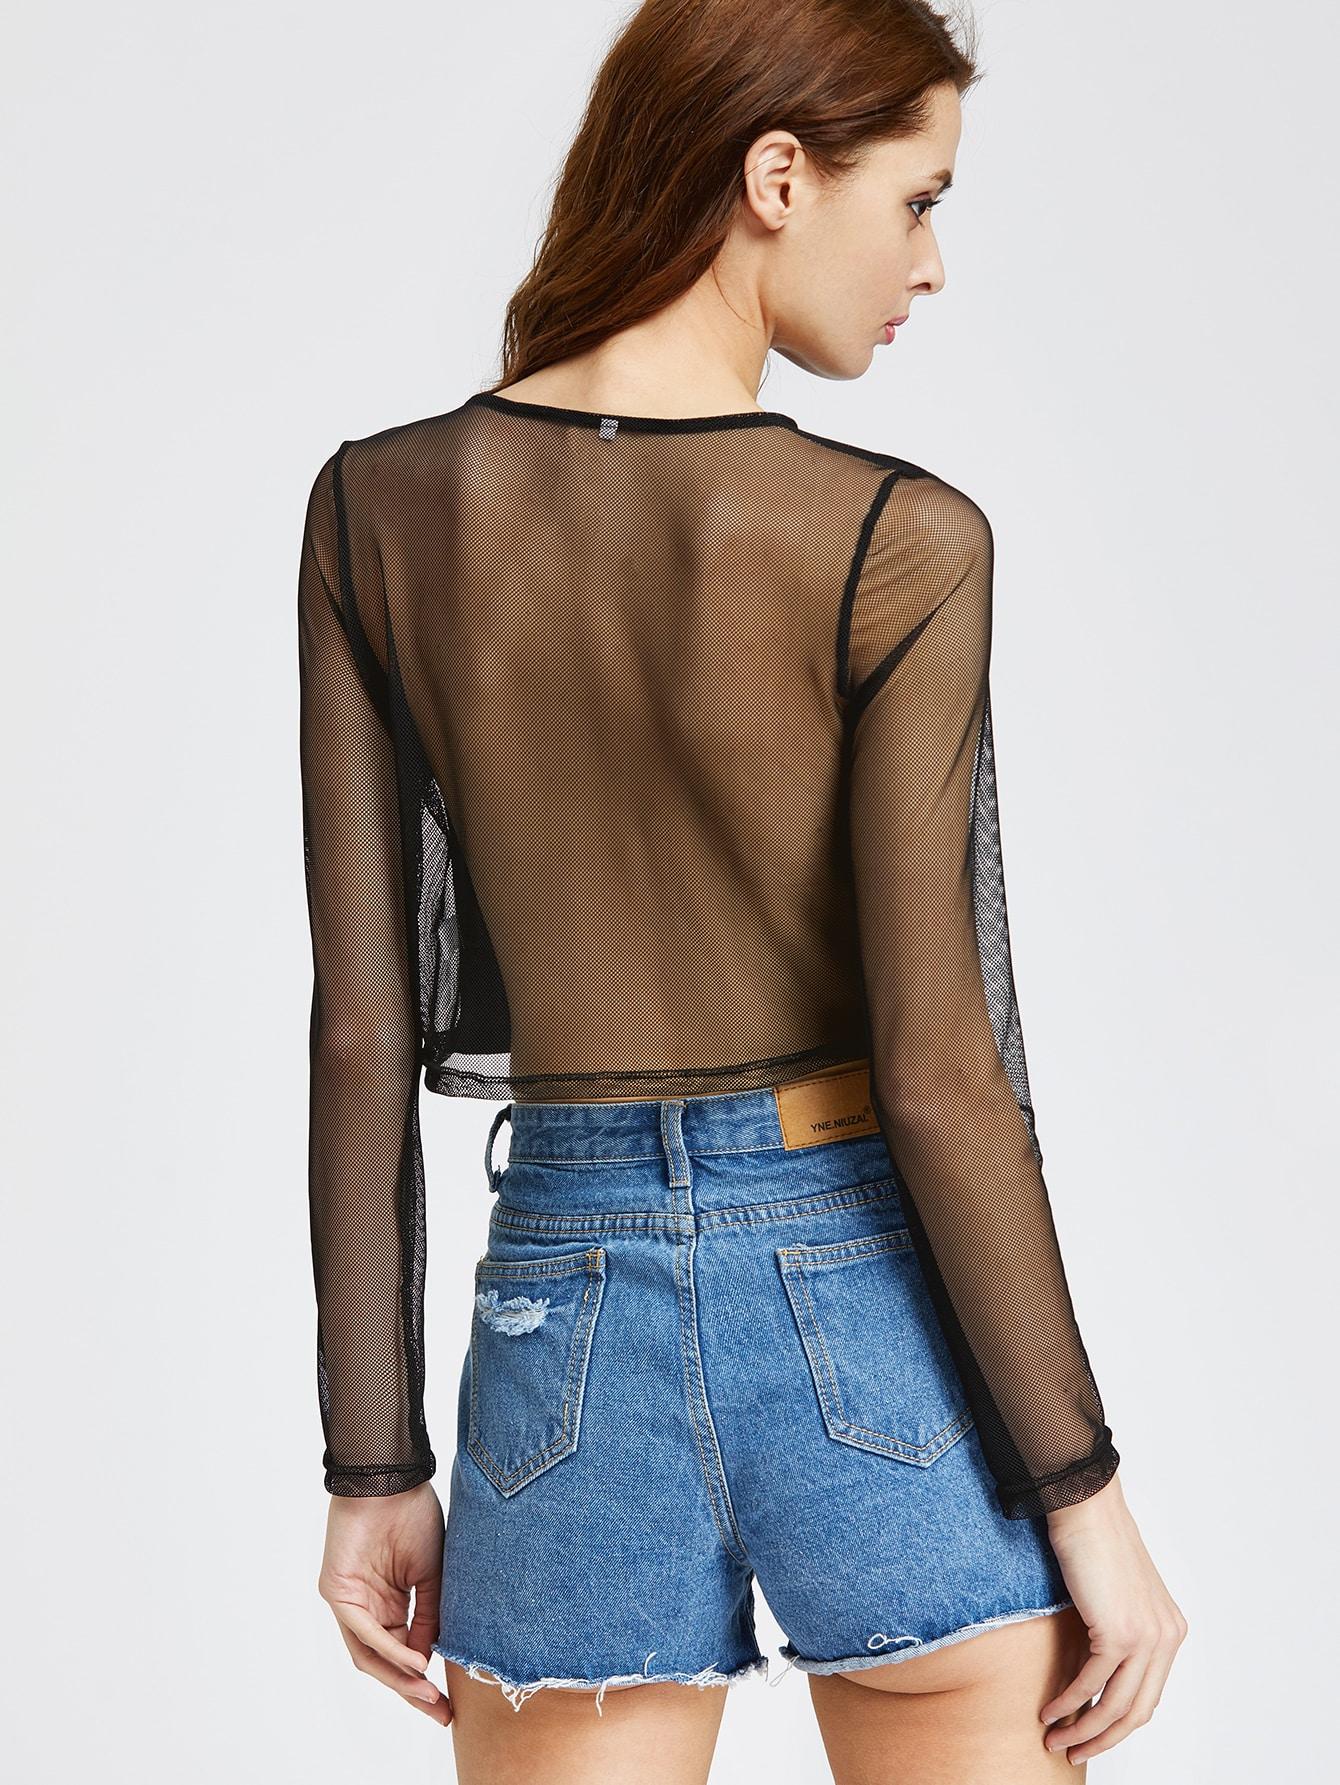 blouse170313001_2